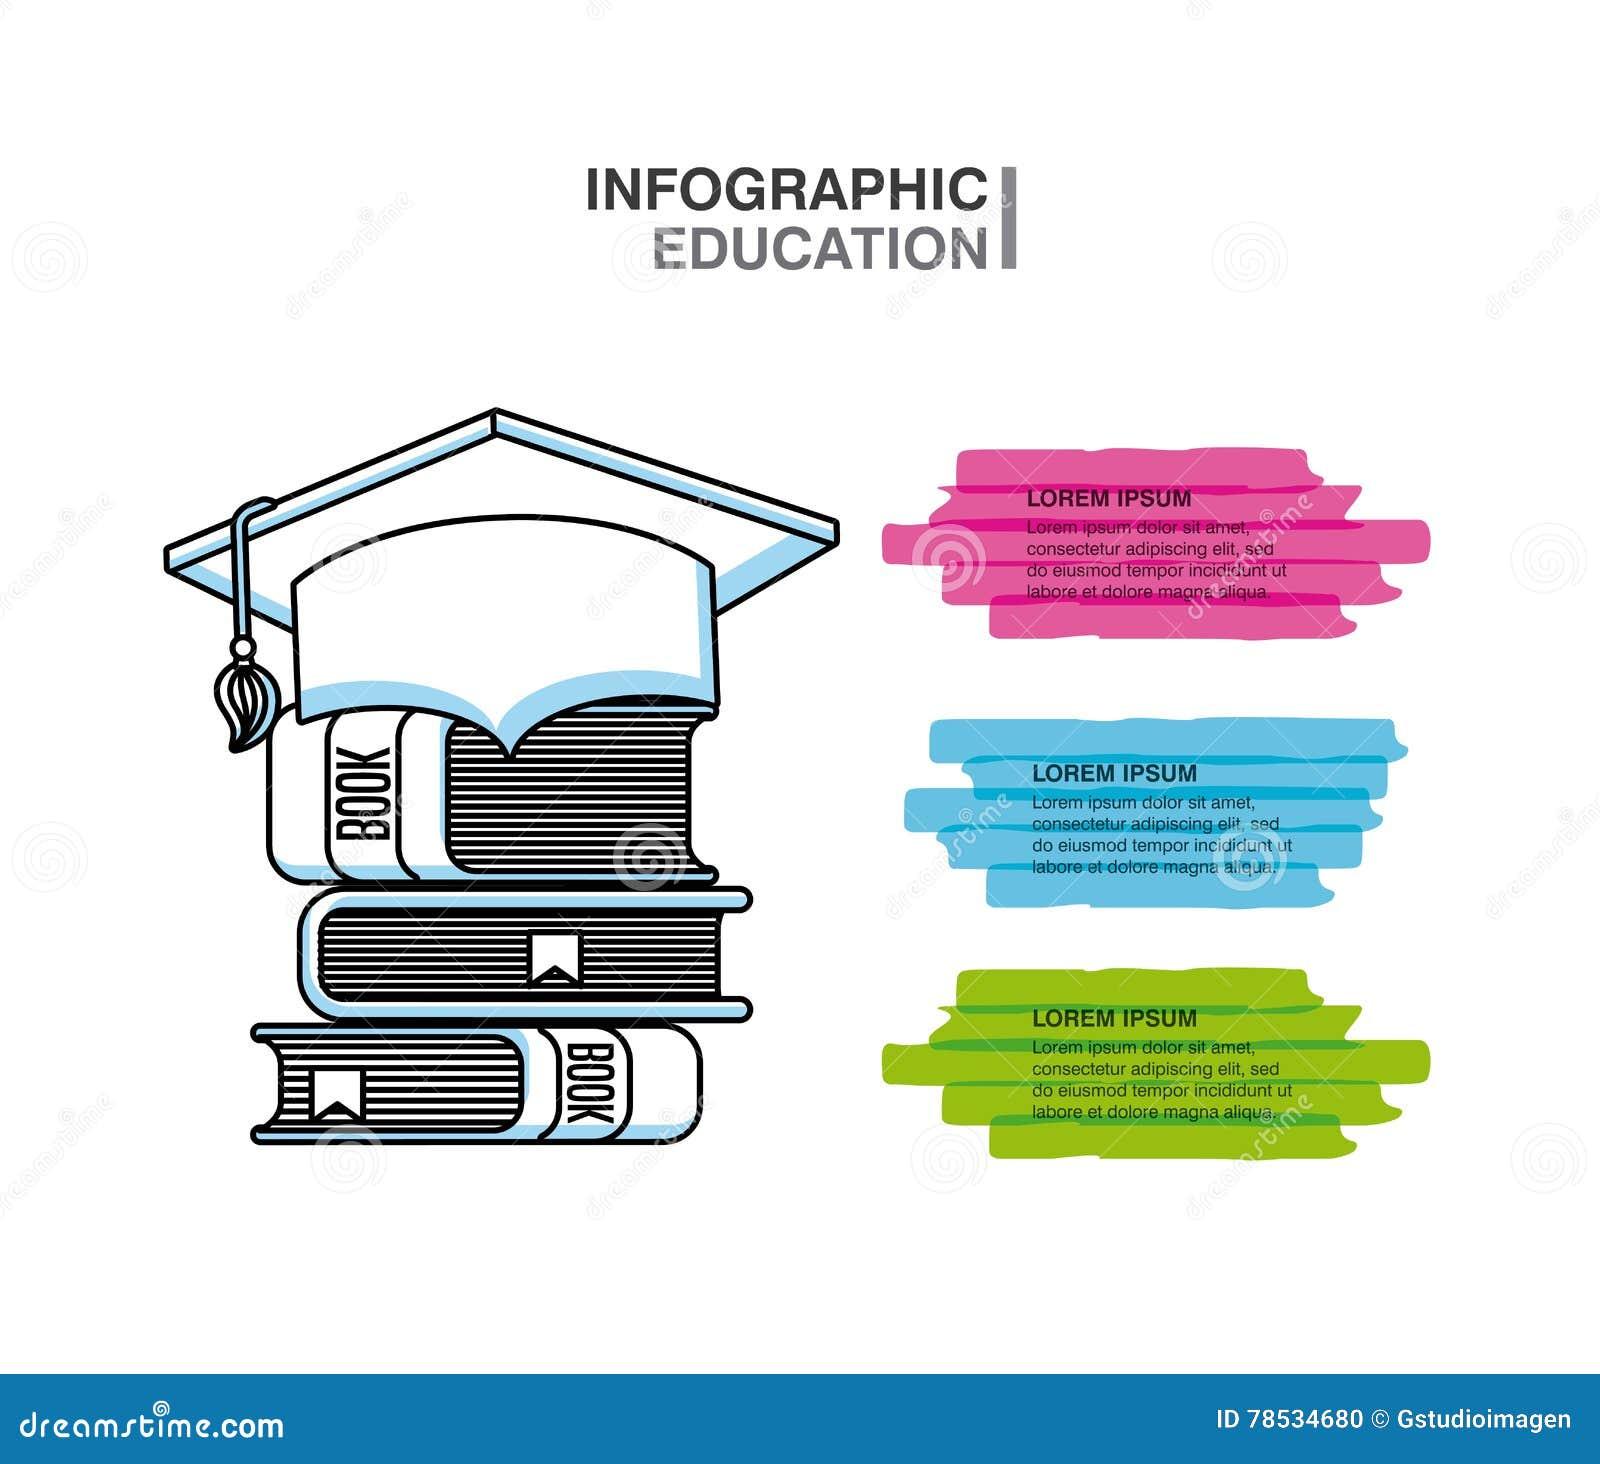 infographic education presentation icons stock illustration